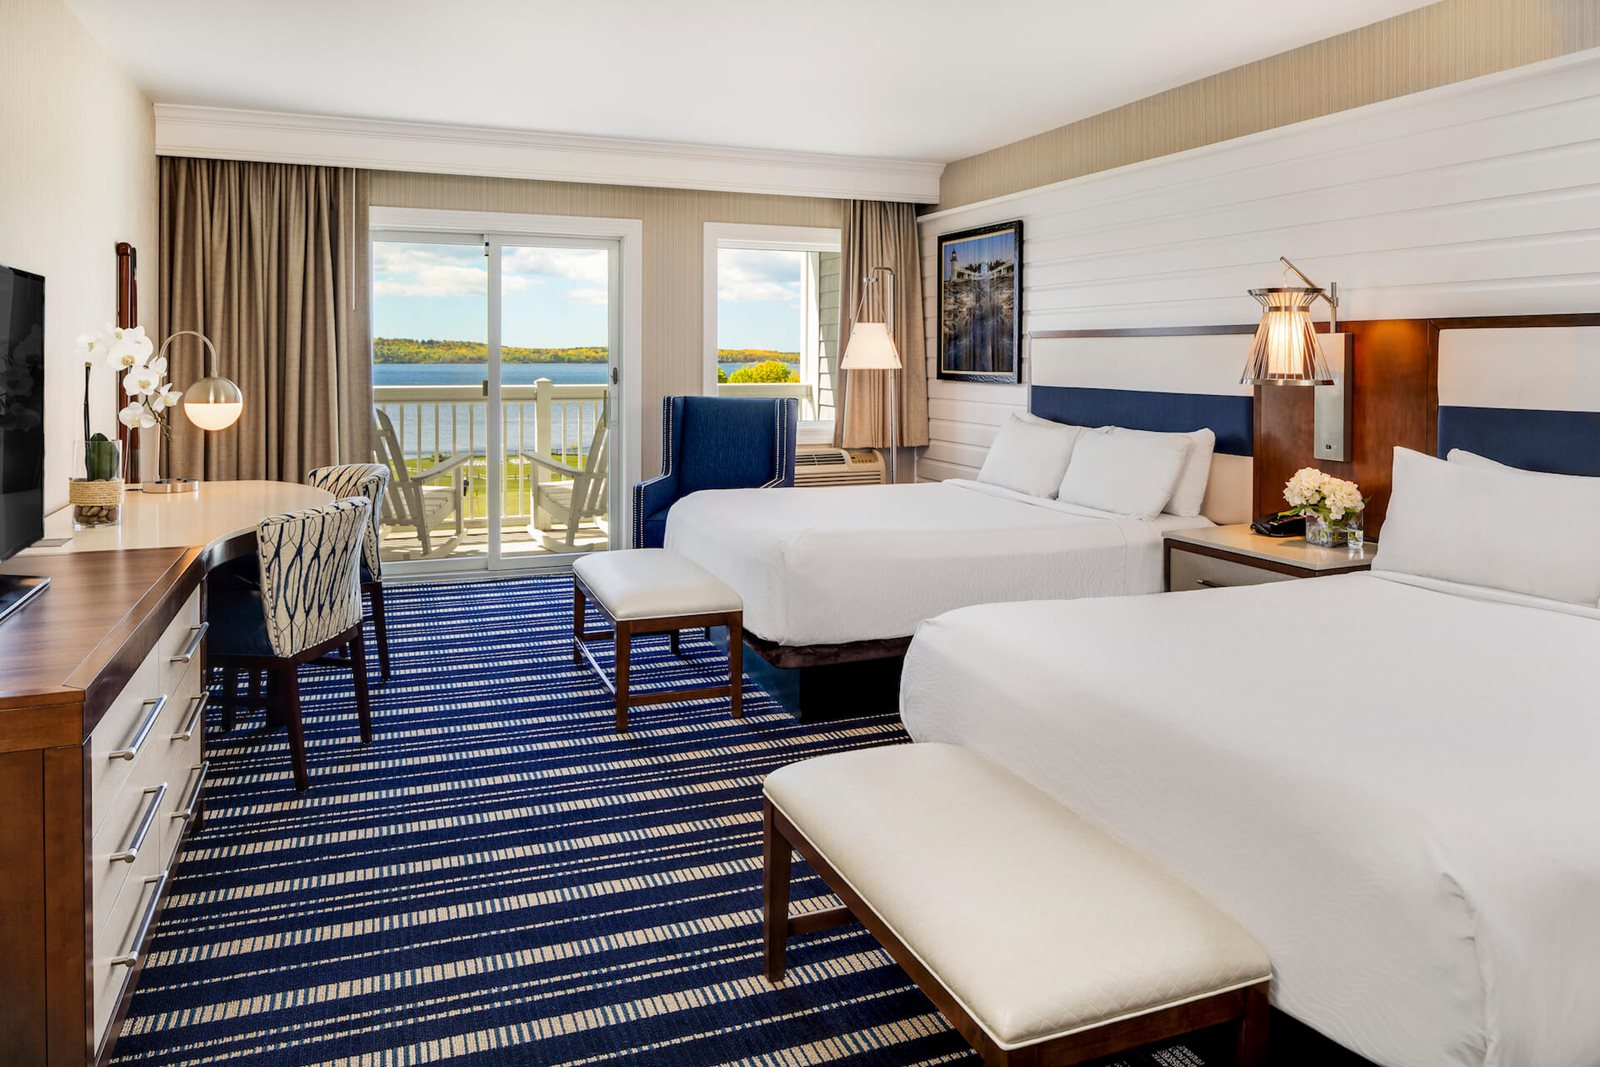 Interior of resort room at Samoset Resort, Maine